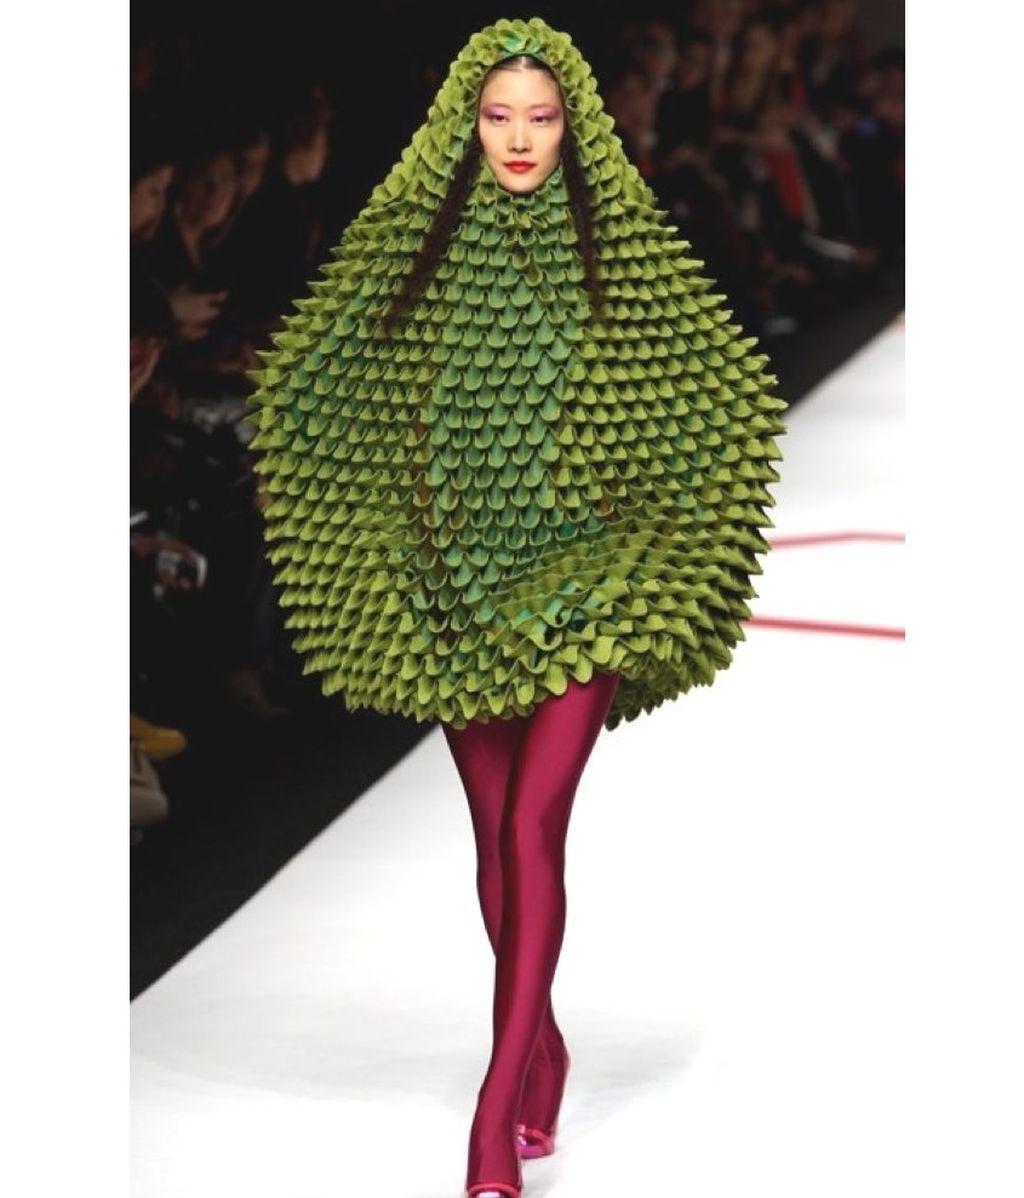 weird-fashion-clothes-funny-hilarious-pics-3ee34bd987db21fc77f7c0a6bdd1d91f-fashion-fail-weird-fashion